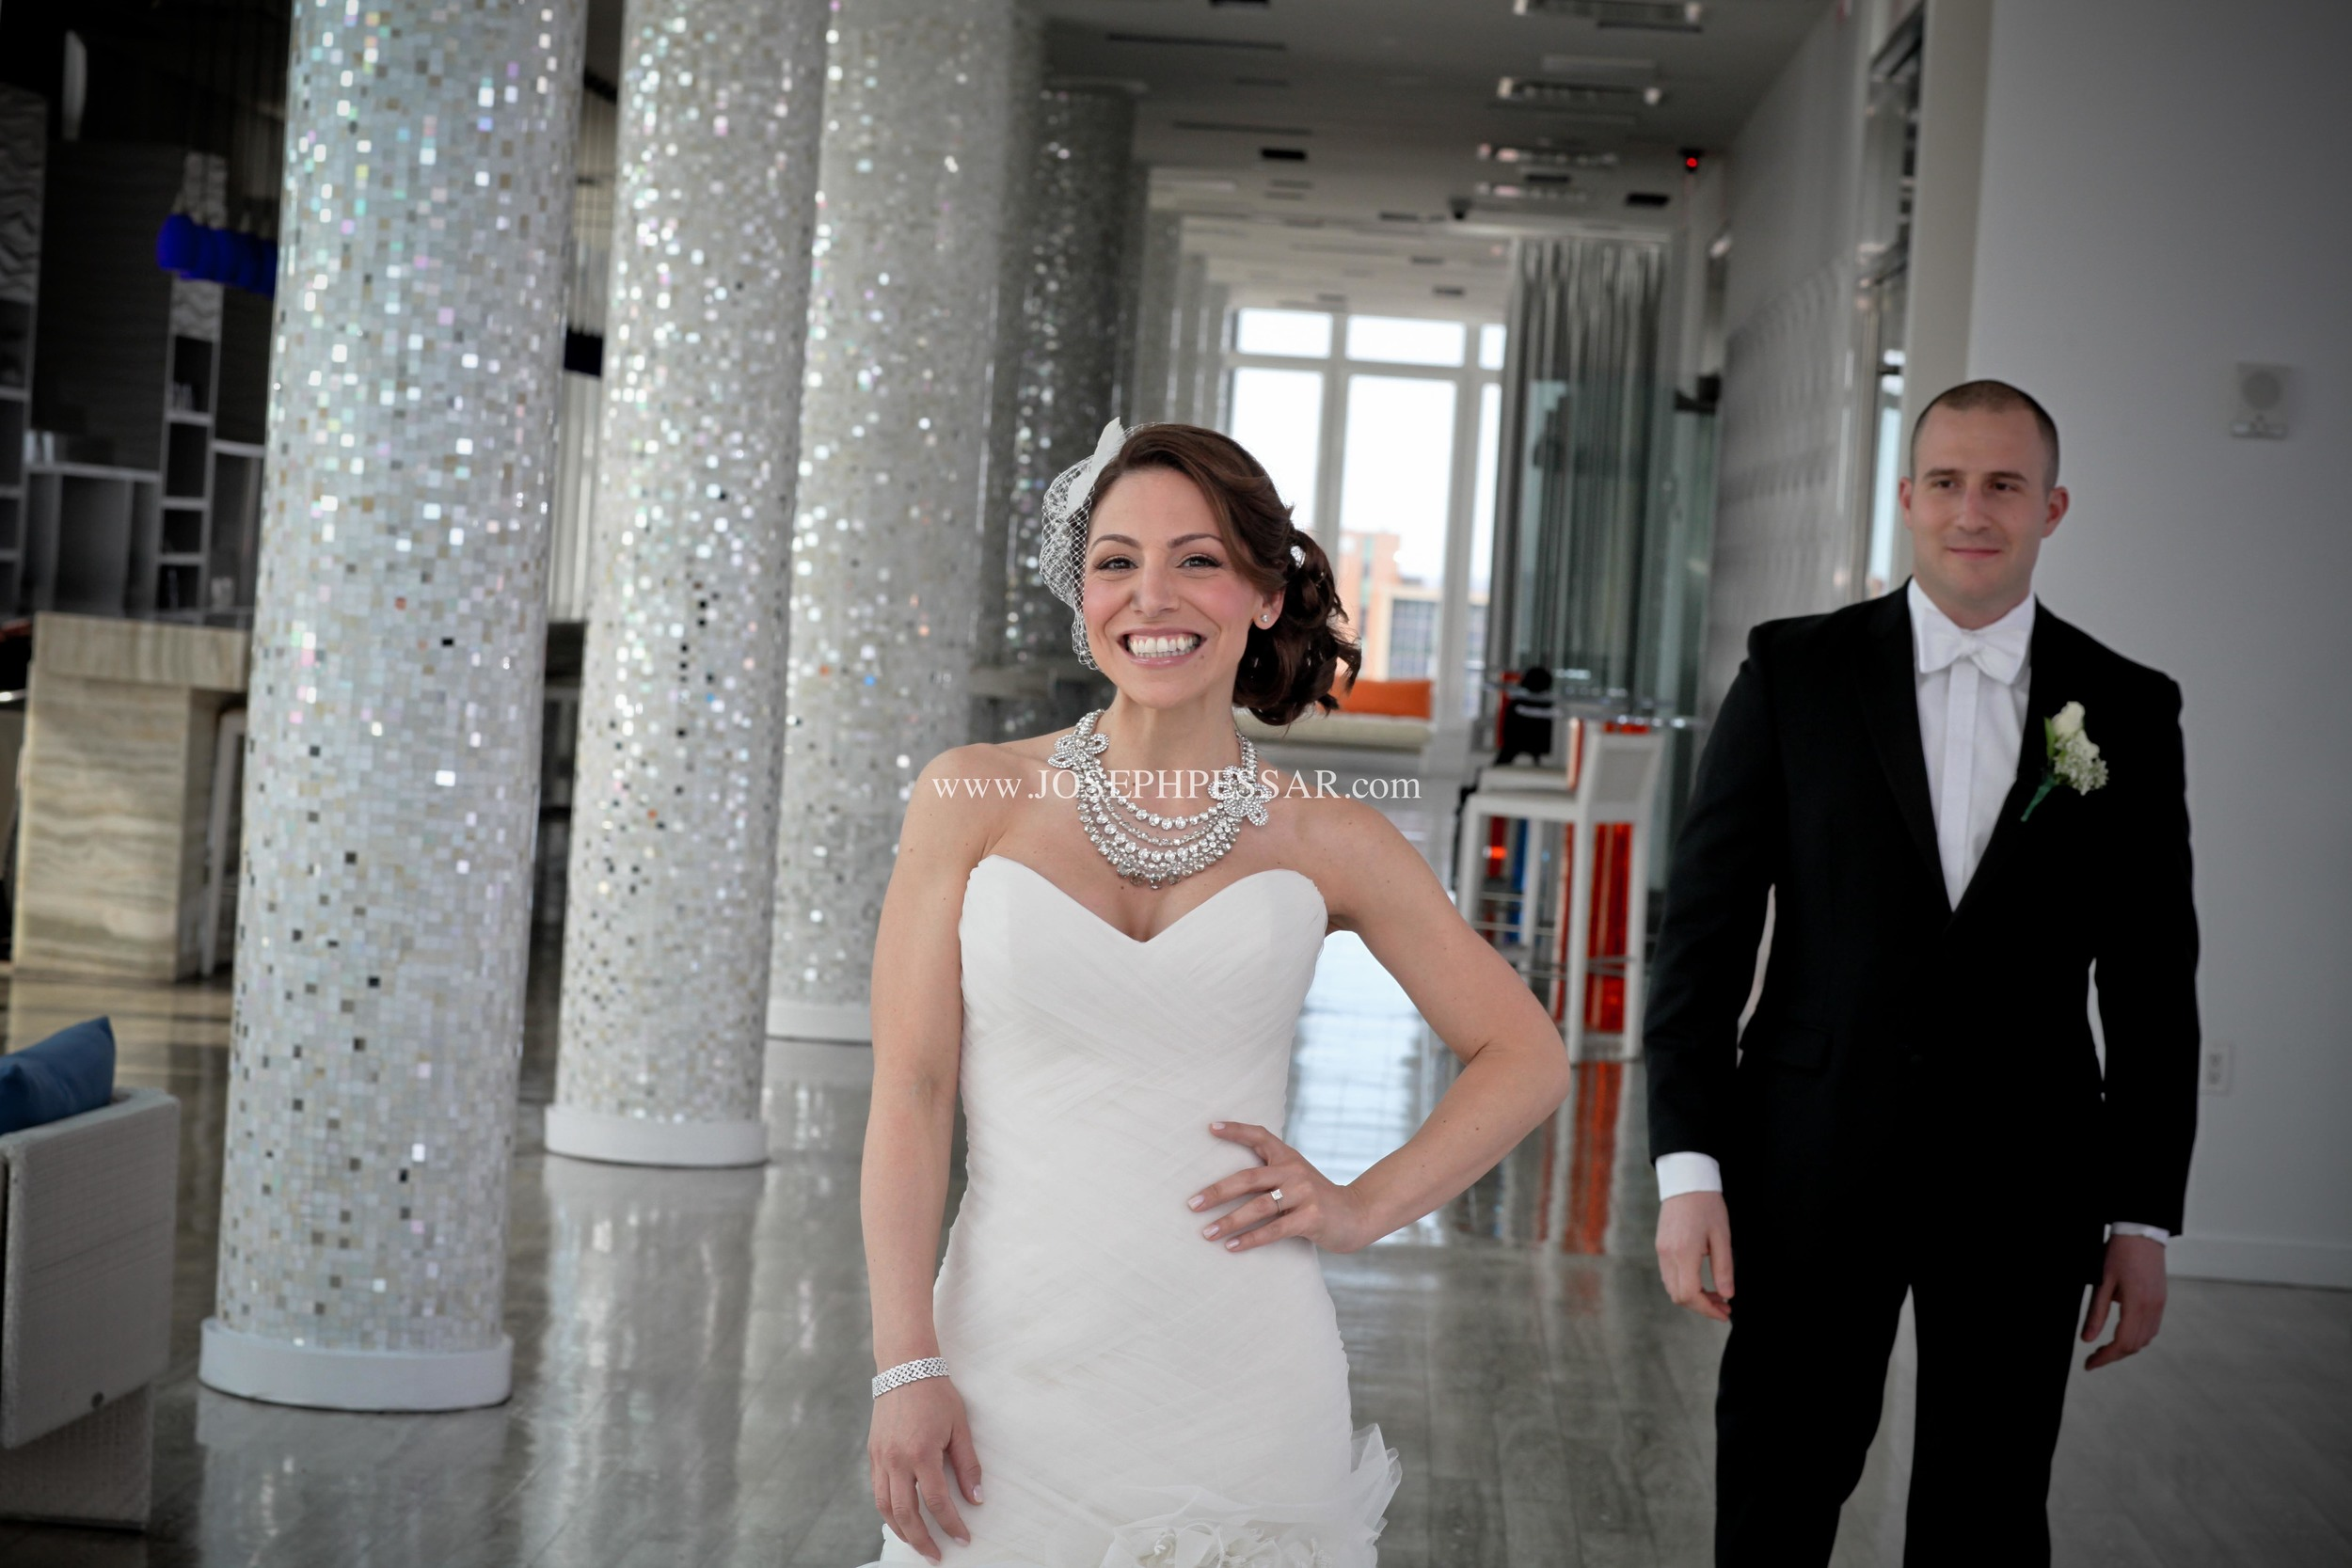 nyc_wedding_photographer0014.jpg